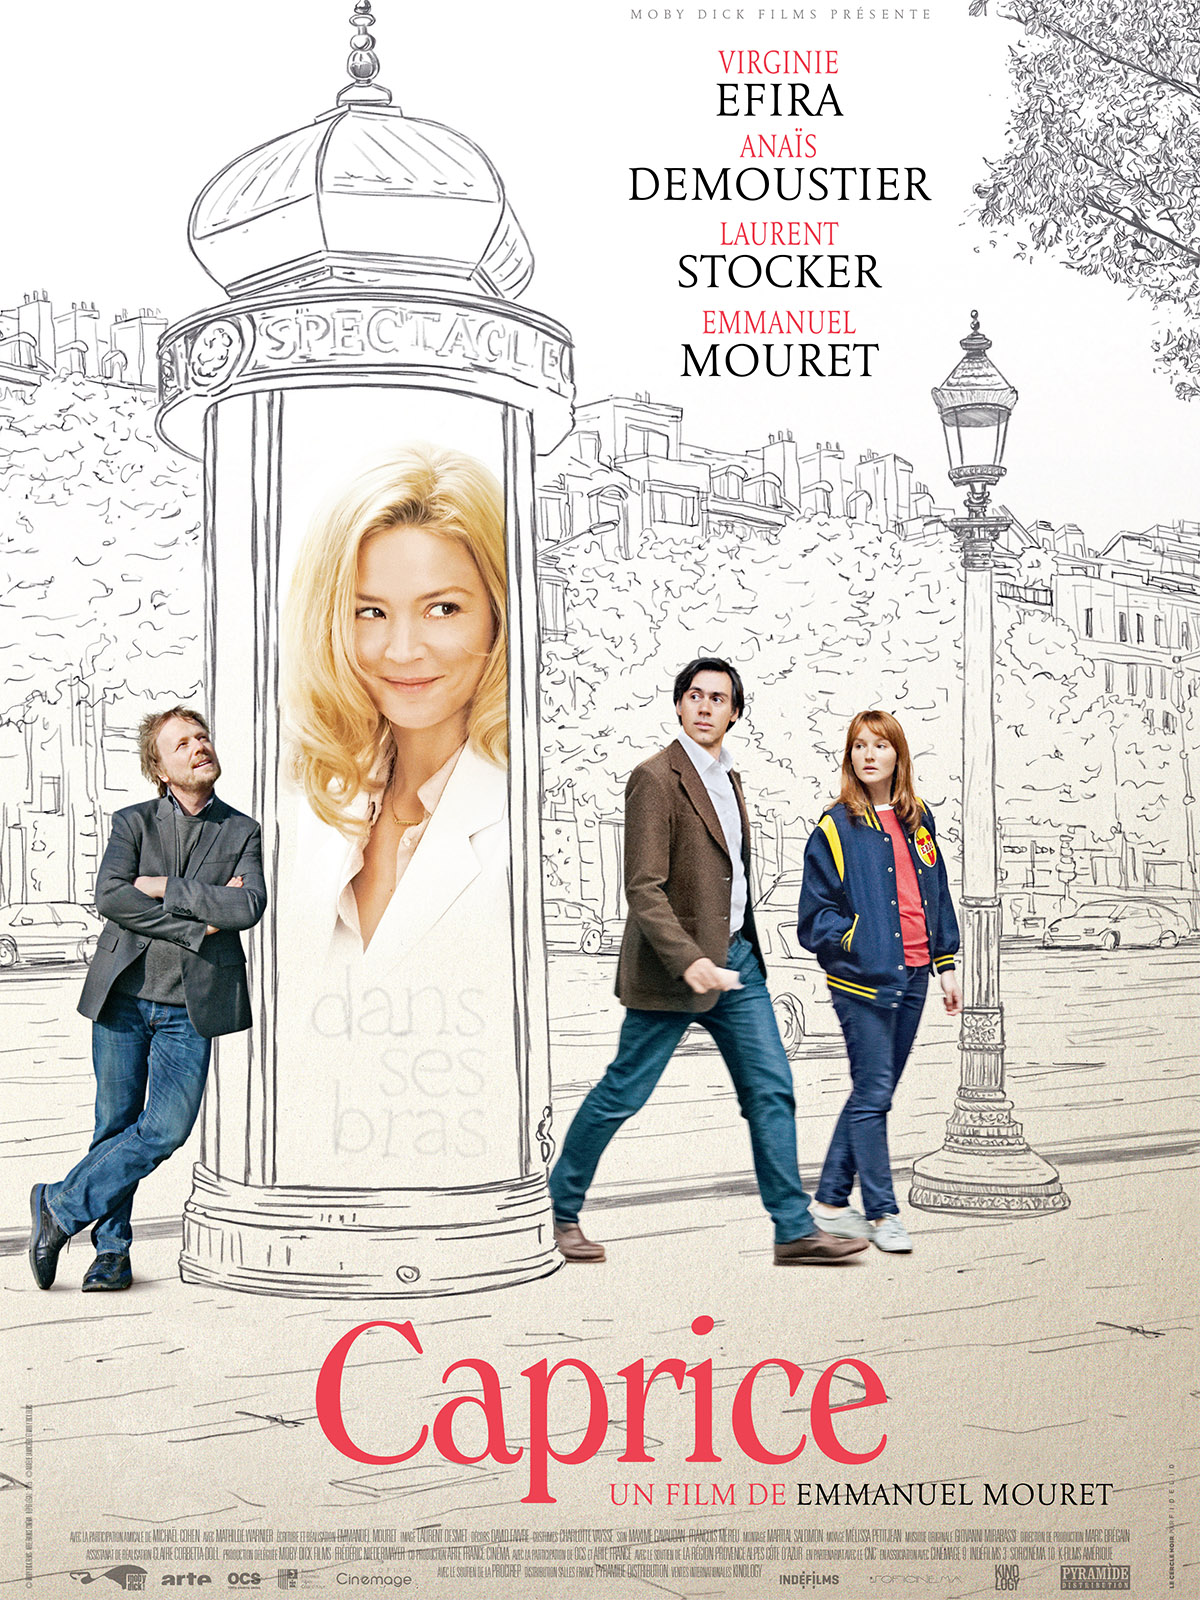 Ciné, cinéma, cinémas... - Page 13 088838